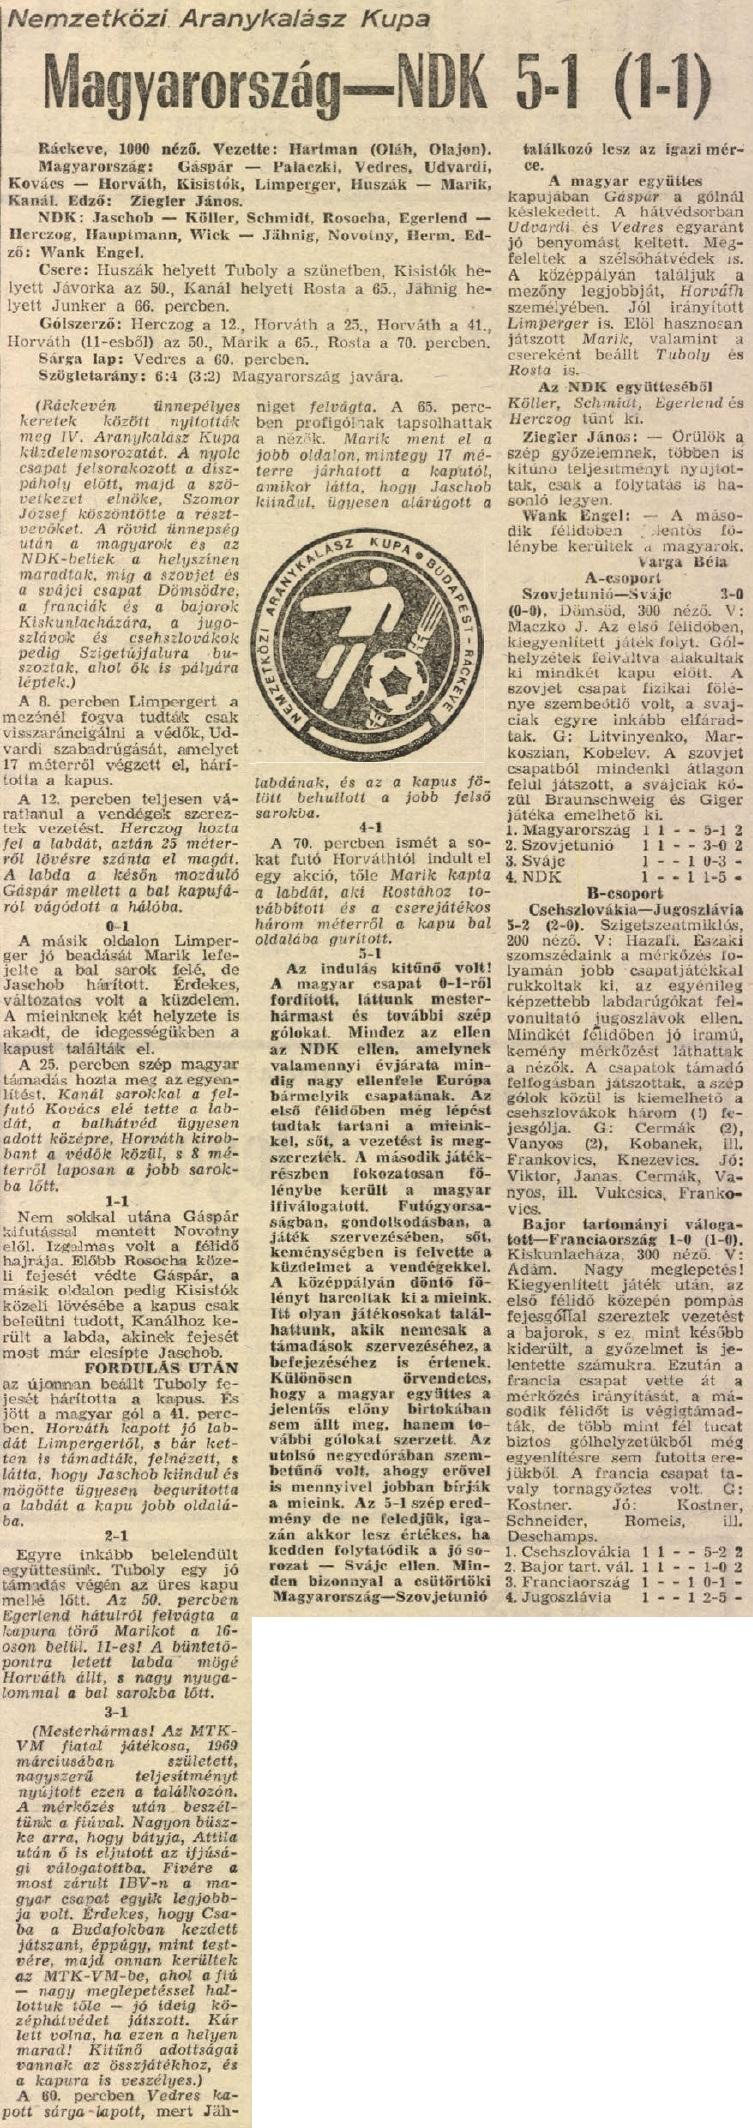 idokapszula_nb_i_1983_84_tavaszi_zaras_tabellaparade_aranykalasz_kupa_magyarorszag_ndk.jpg